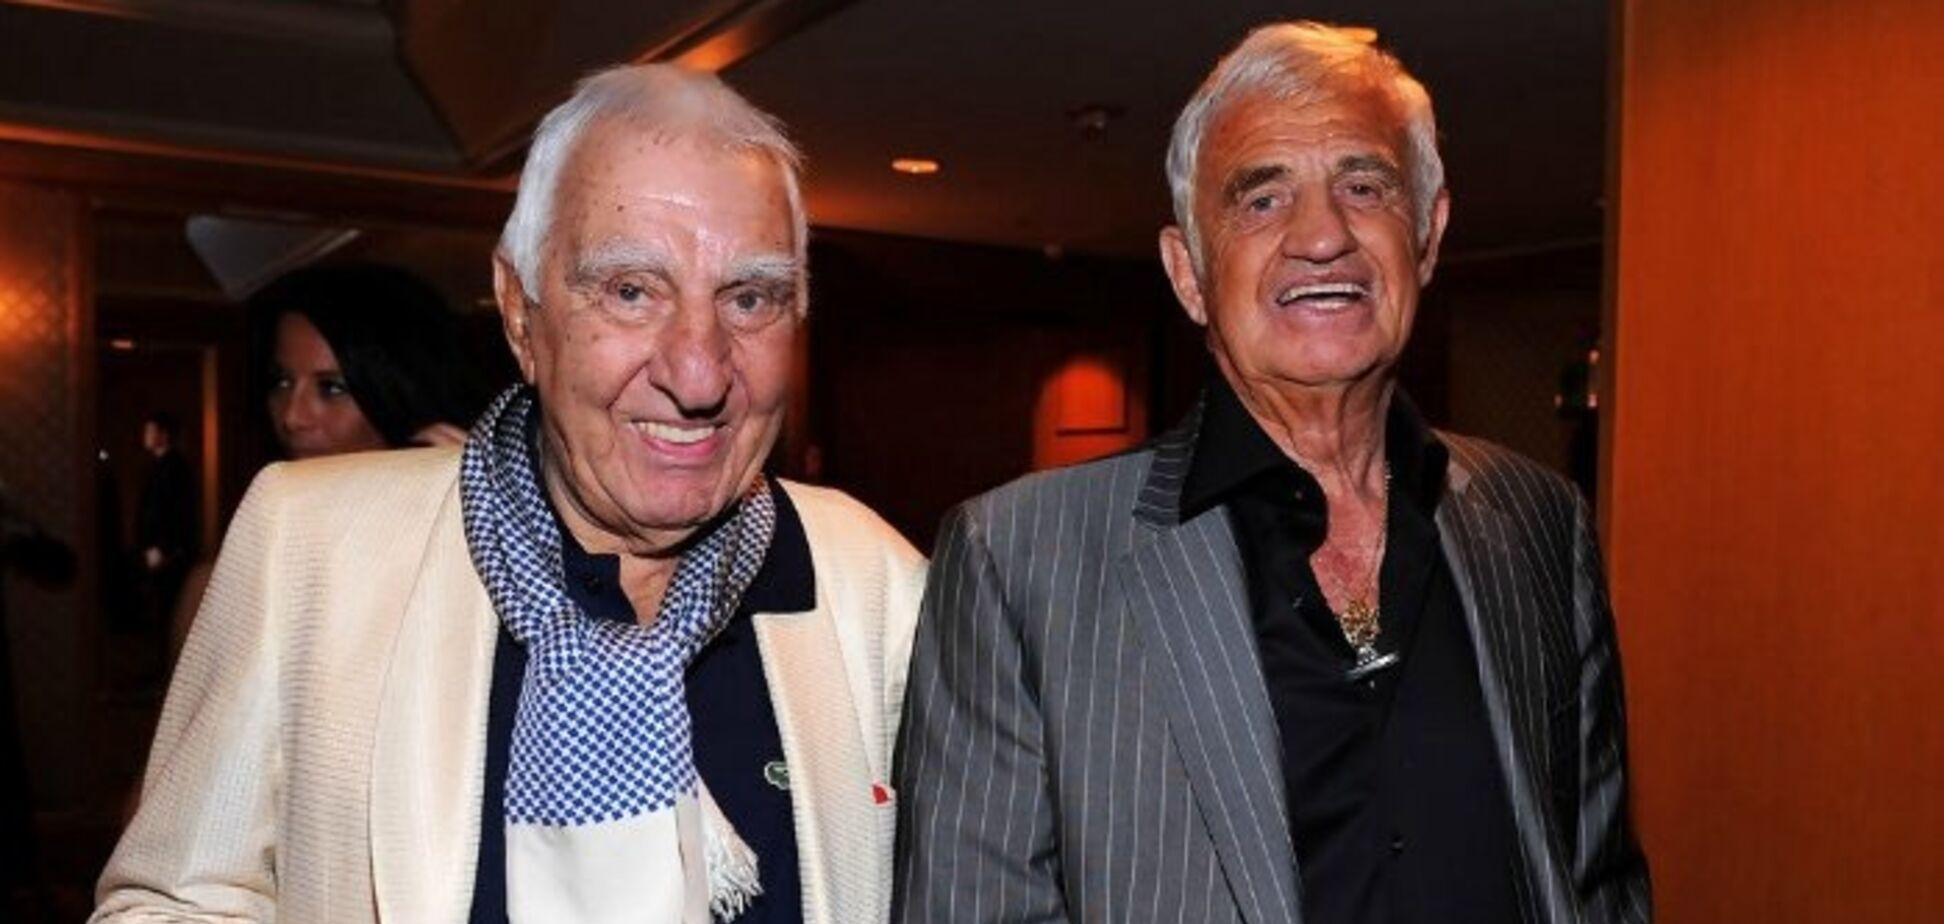 Умер знаменитый друг Бельмондо: чем известен французский актер